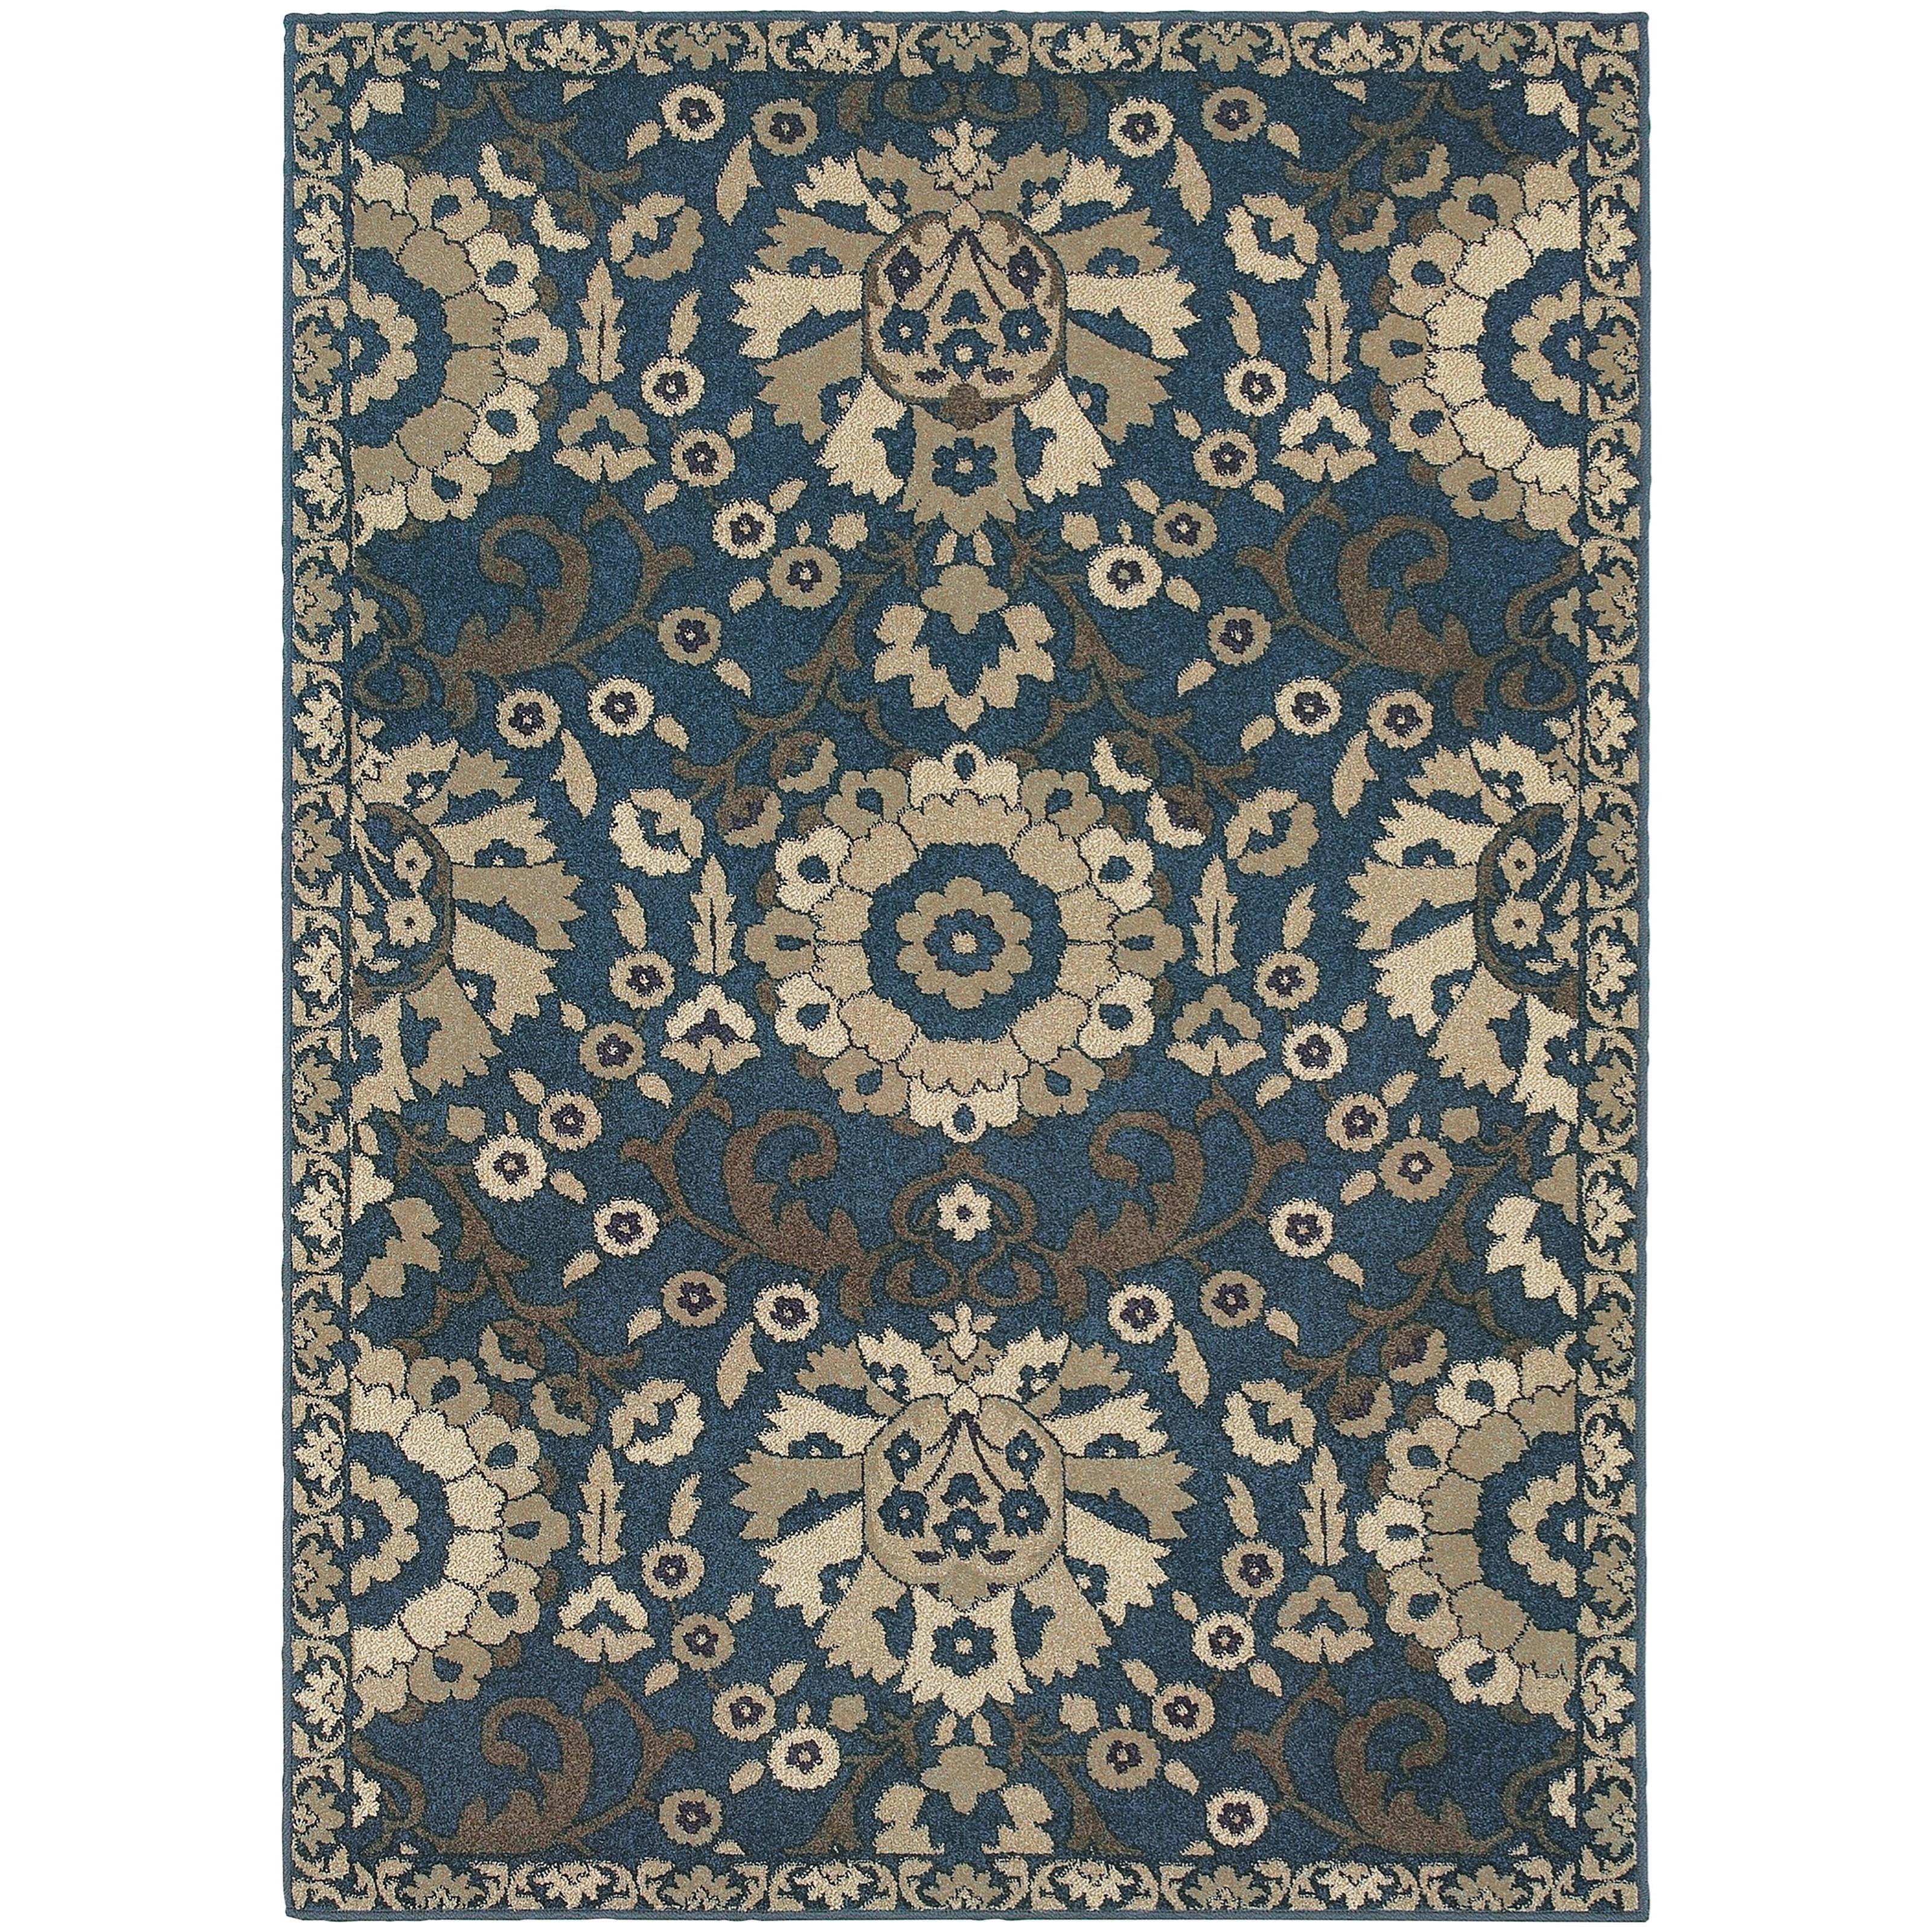 "Oriental Weavers Highlands 3'10"" X  5' 5"" Rectangle Area Rug - Item Number: HIG6682A310X55"